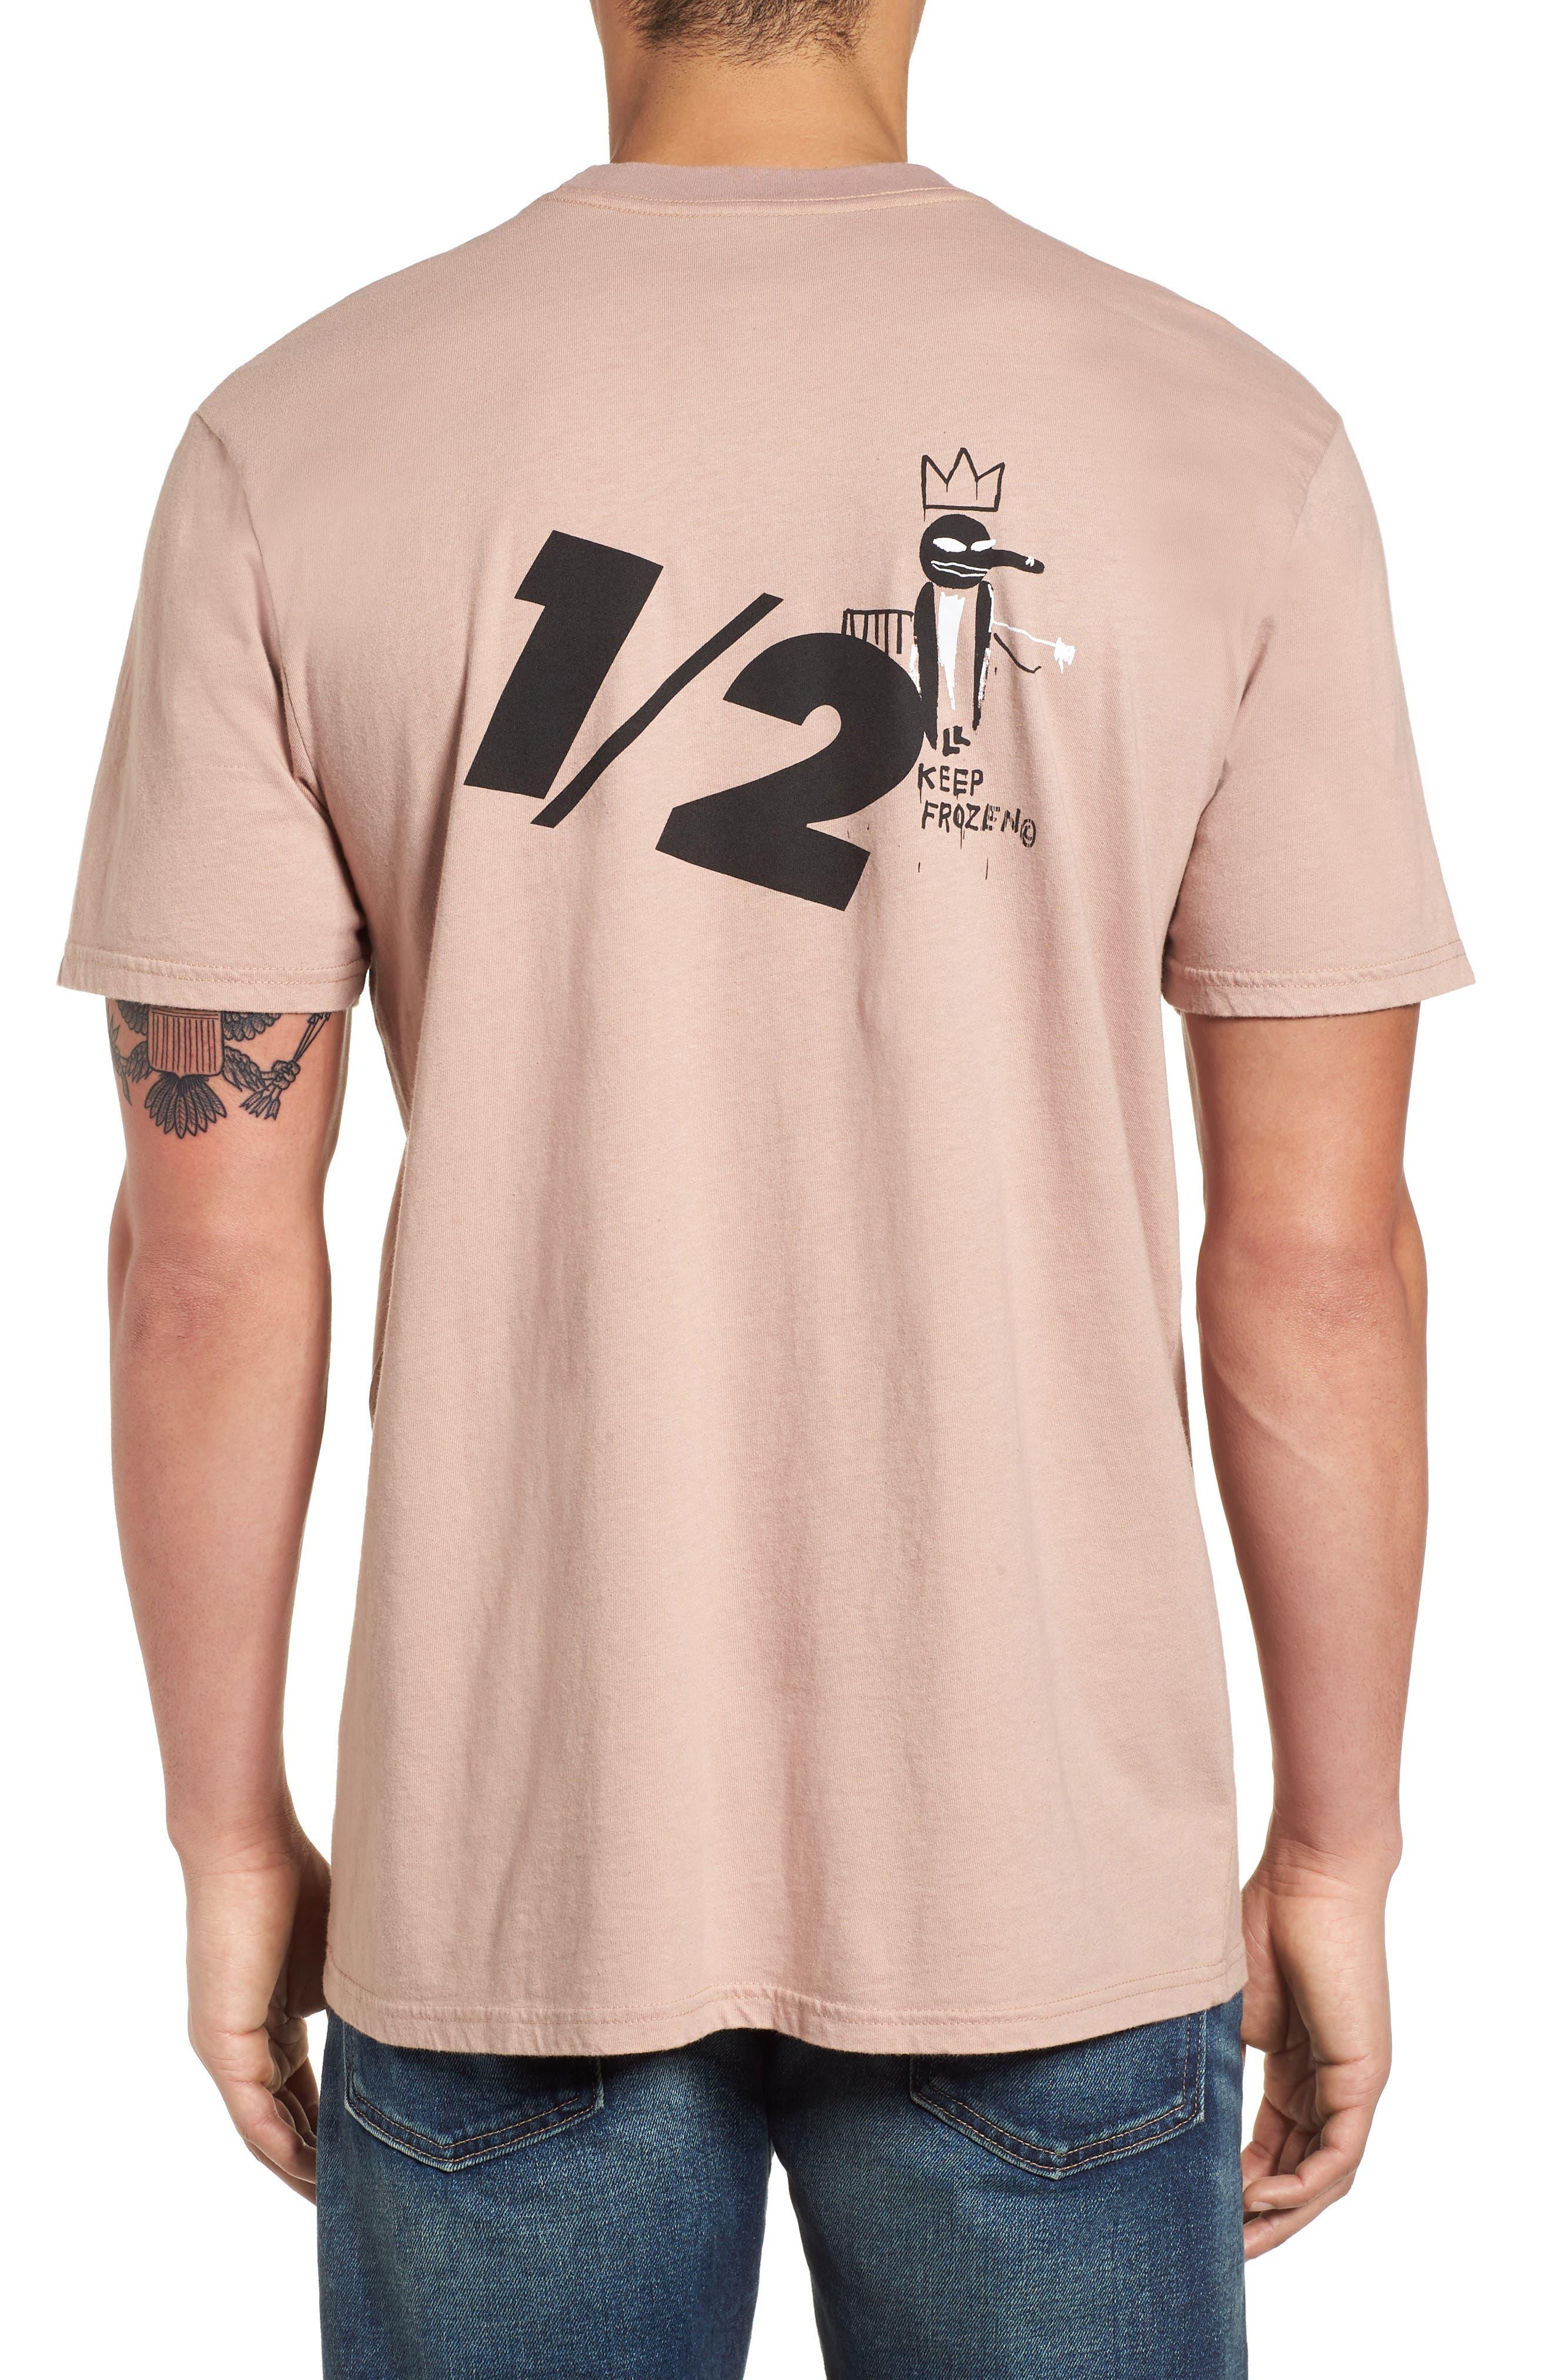 x Warhol Half T-Shirt,                             Alternate thumbnail 2, color,                             Ash Rose